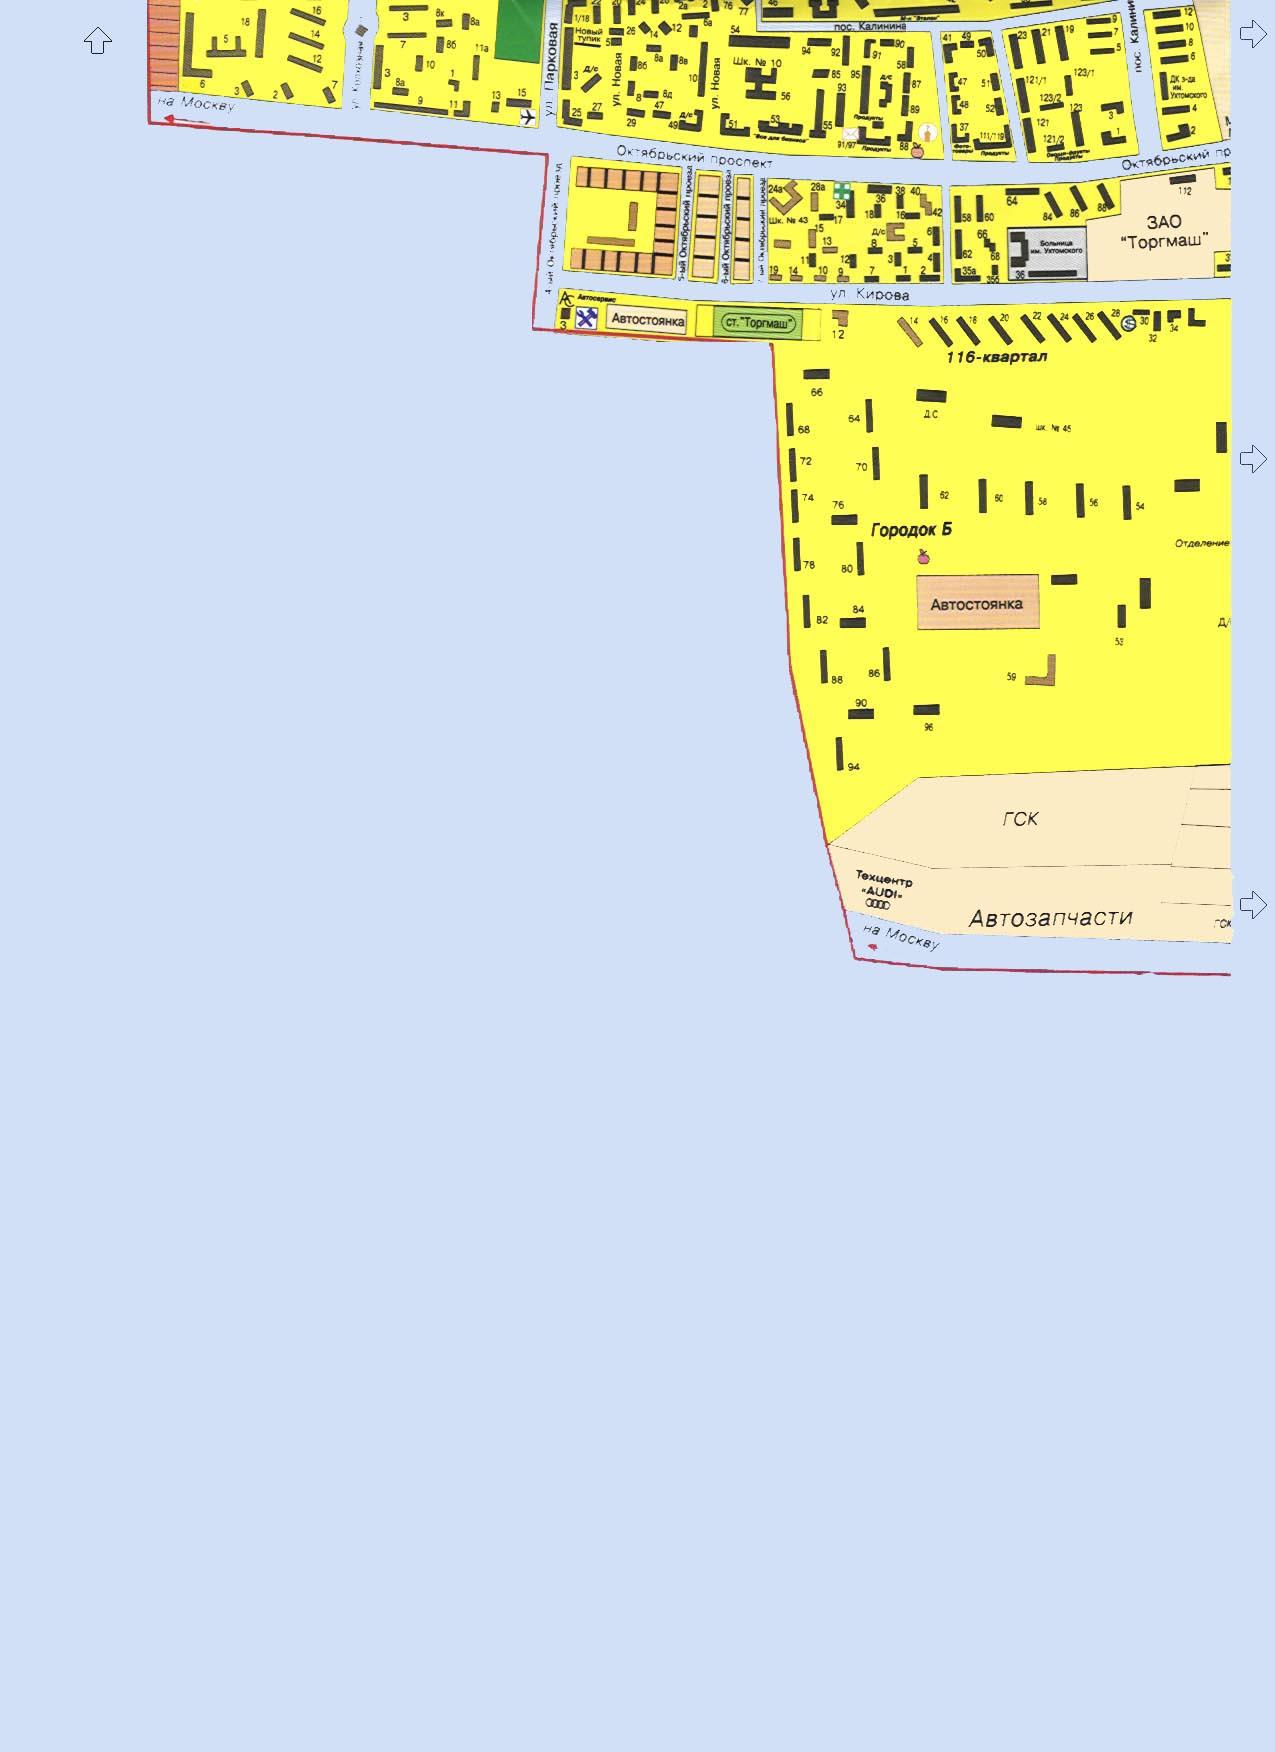 Карта города Люберцы: улица Кирова, поселок Калинина: http://www.314159.ru/lub4.htm